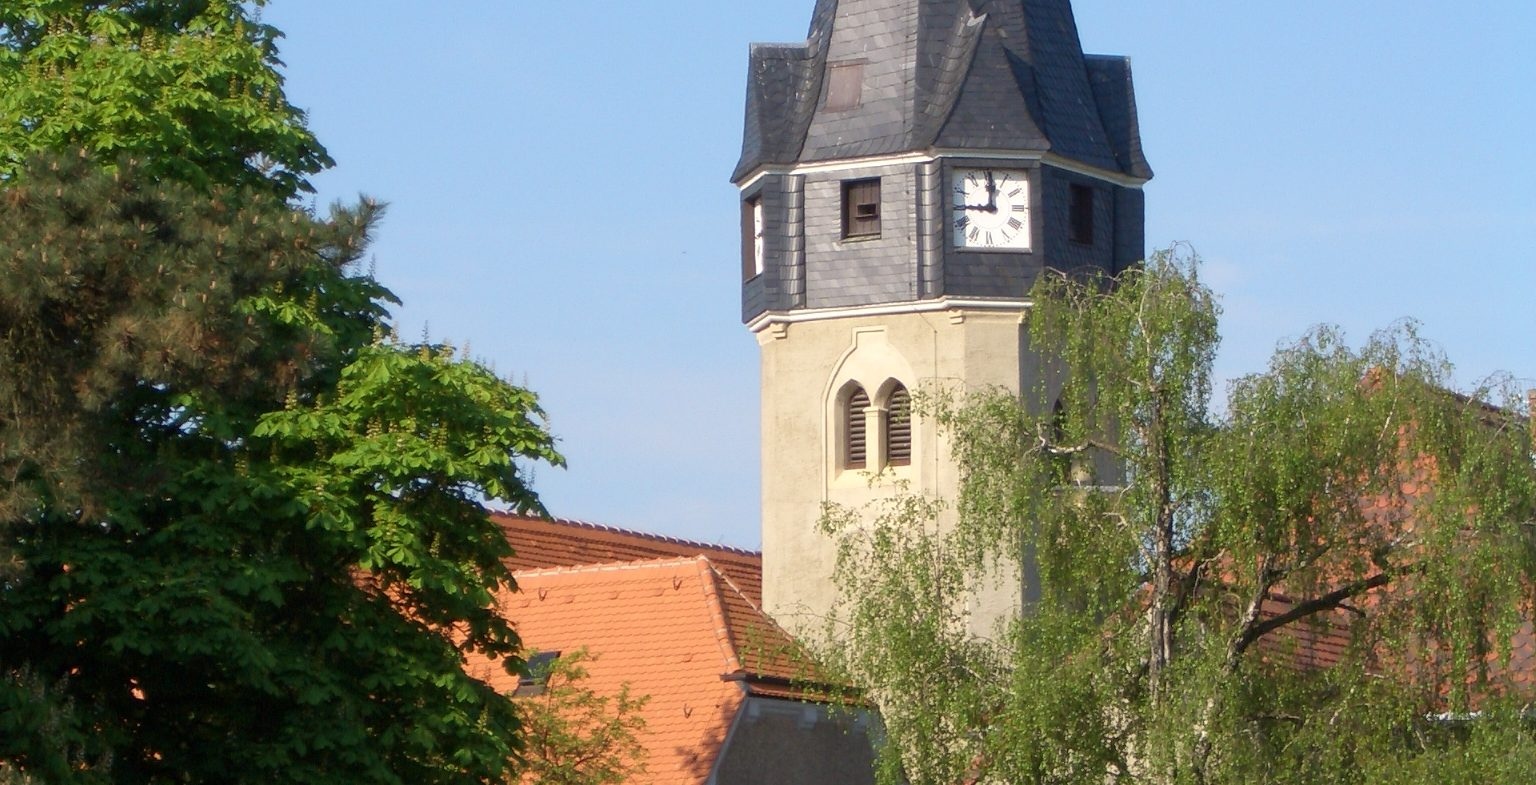 Hainkirche St. Vinzenz Lützschena